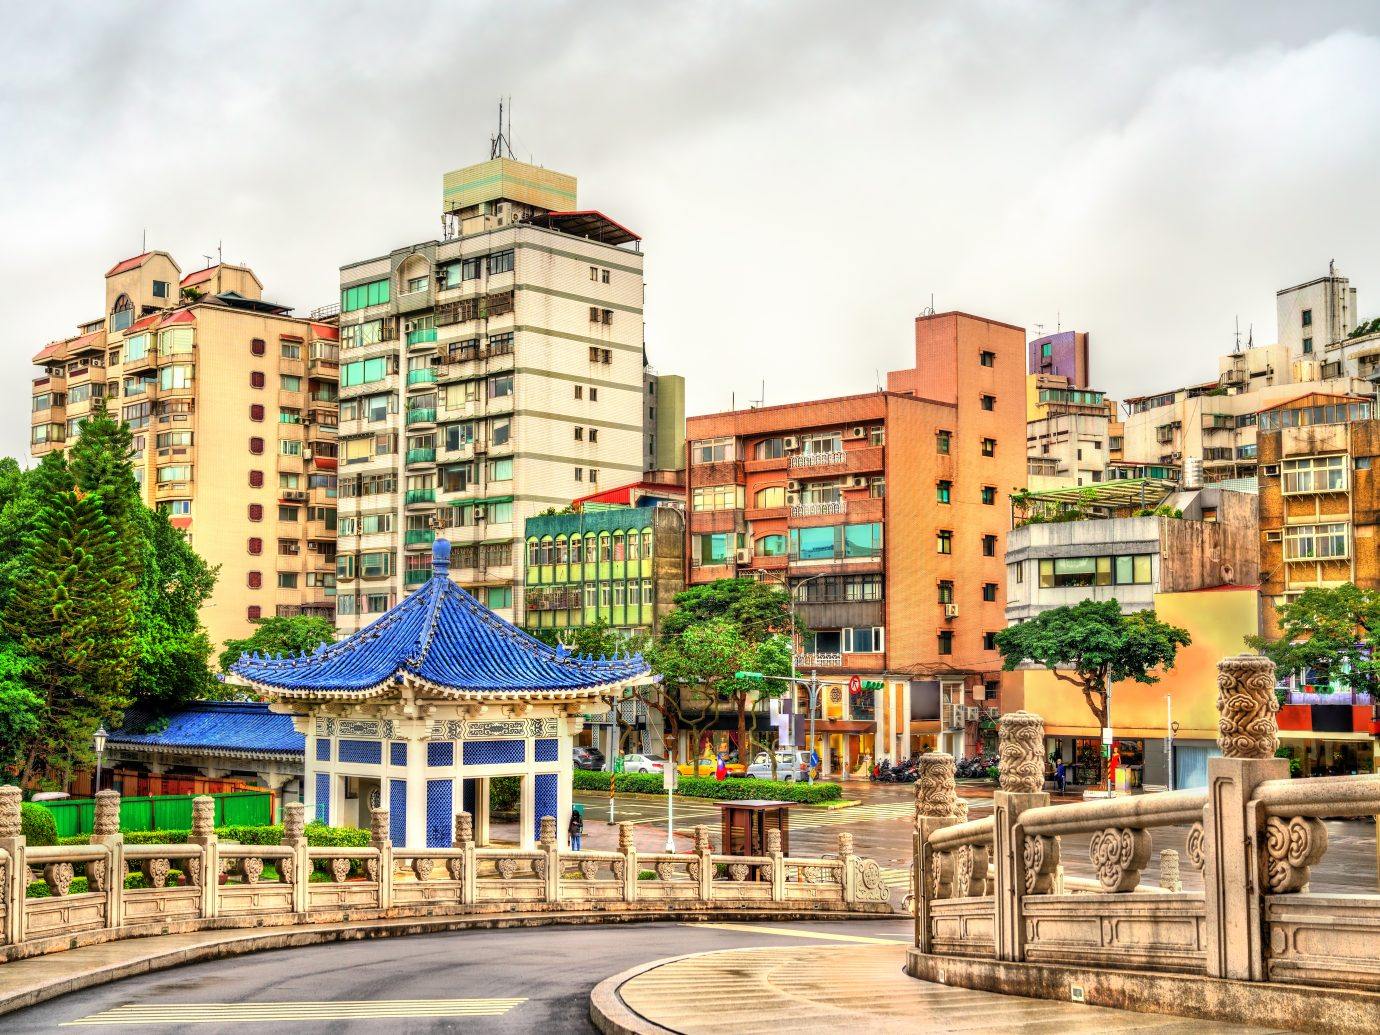 Typical buildings in Zhongzheng District of Taipei